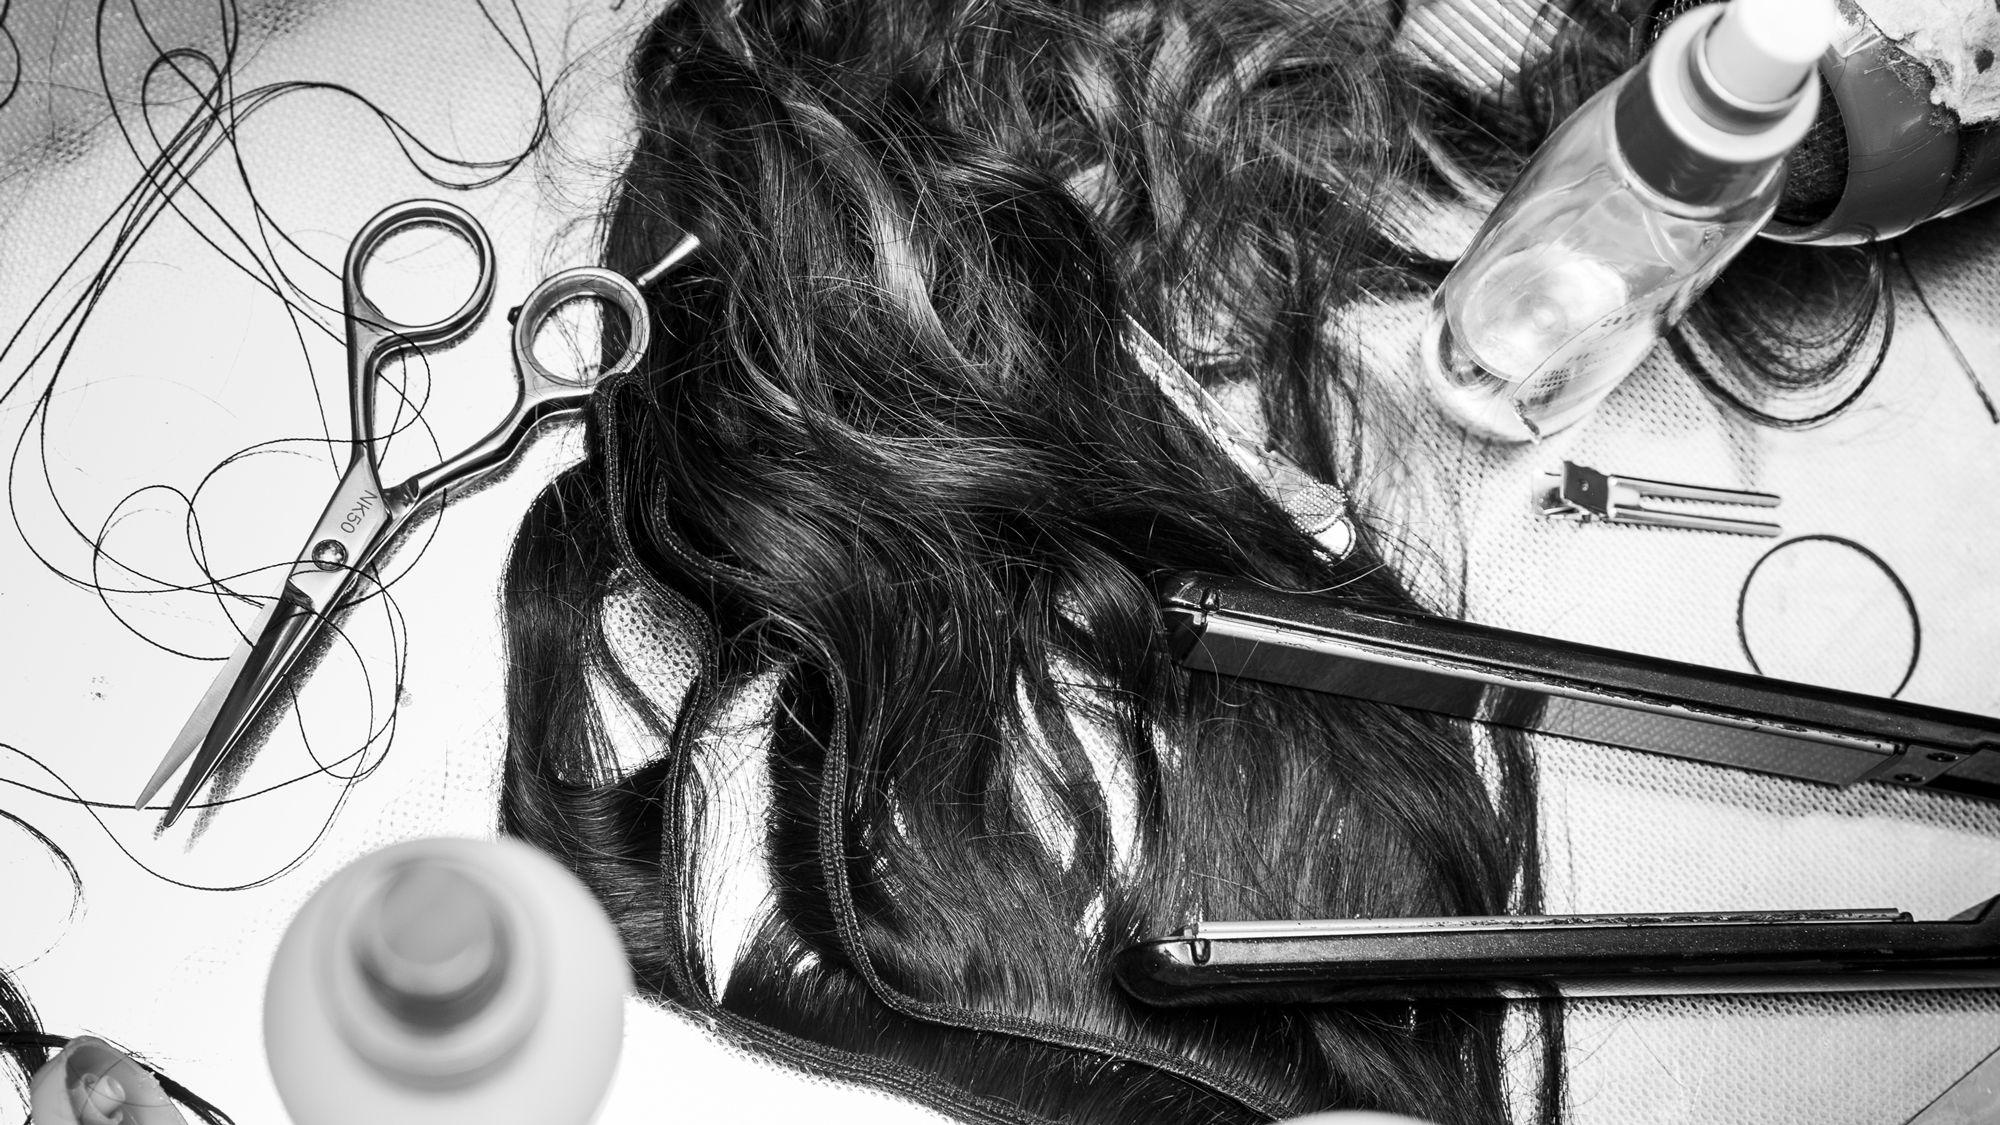 mayvenn hair install service review